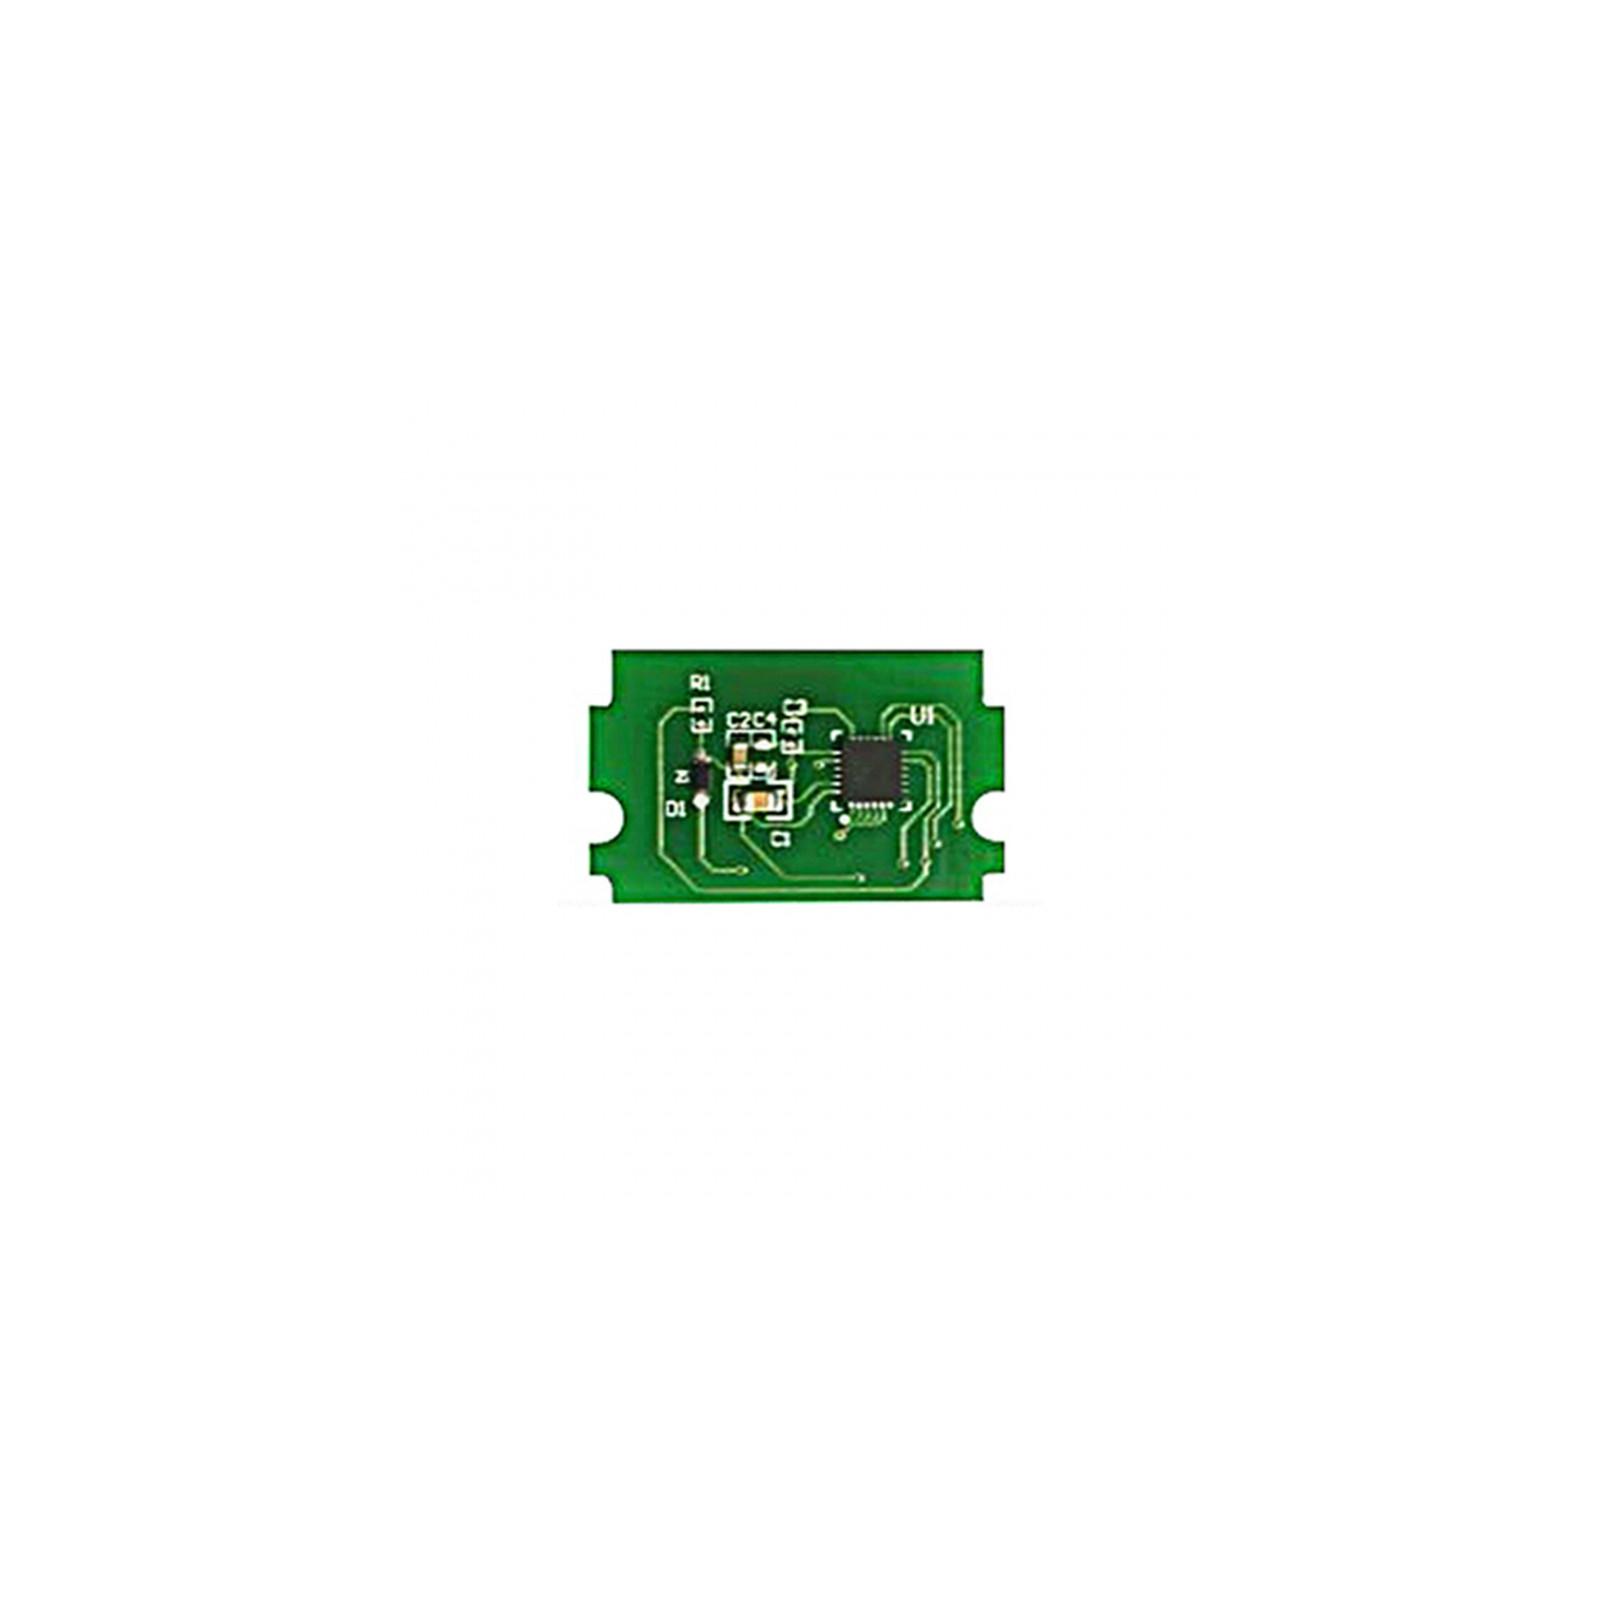 Чип для картриджа Kyocera TK-5230C 2.2k cyan Static Control (TK5230CP-CEU)